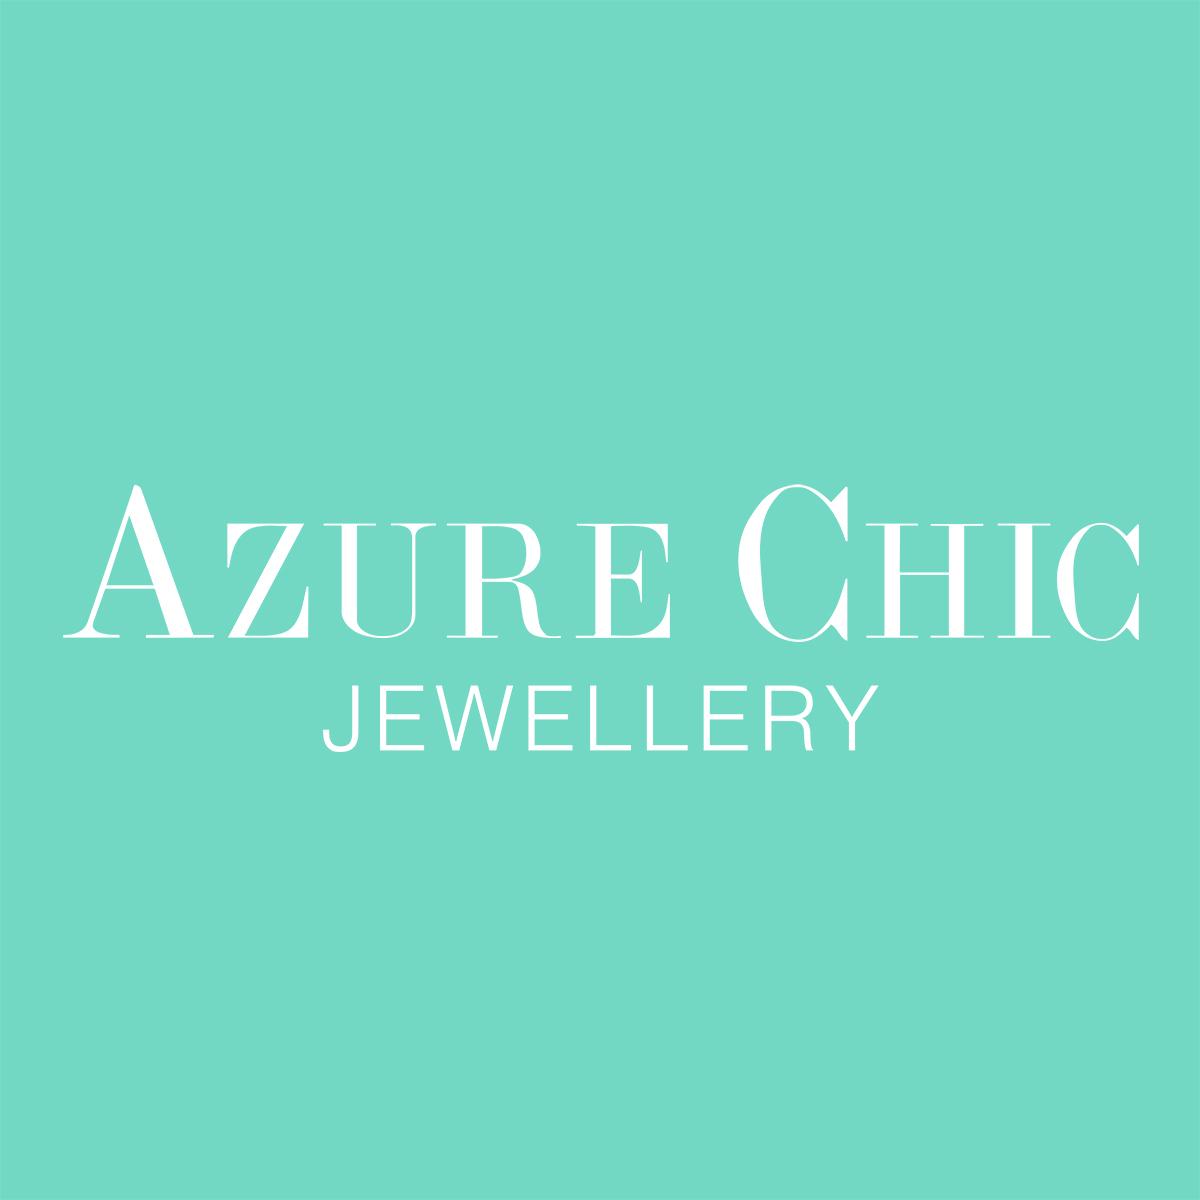 Azure Chic Logo Design Cyprus